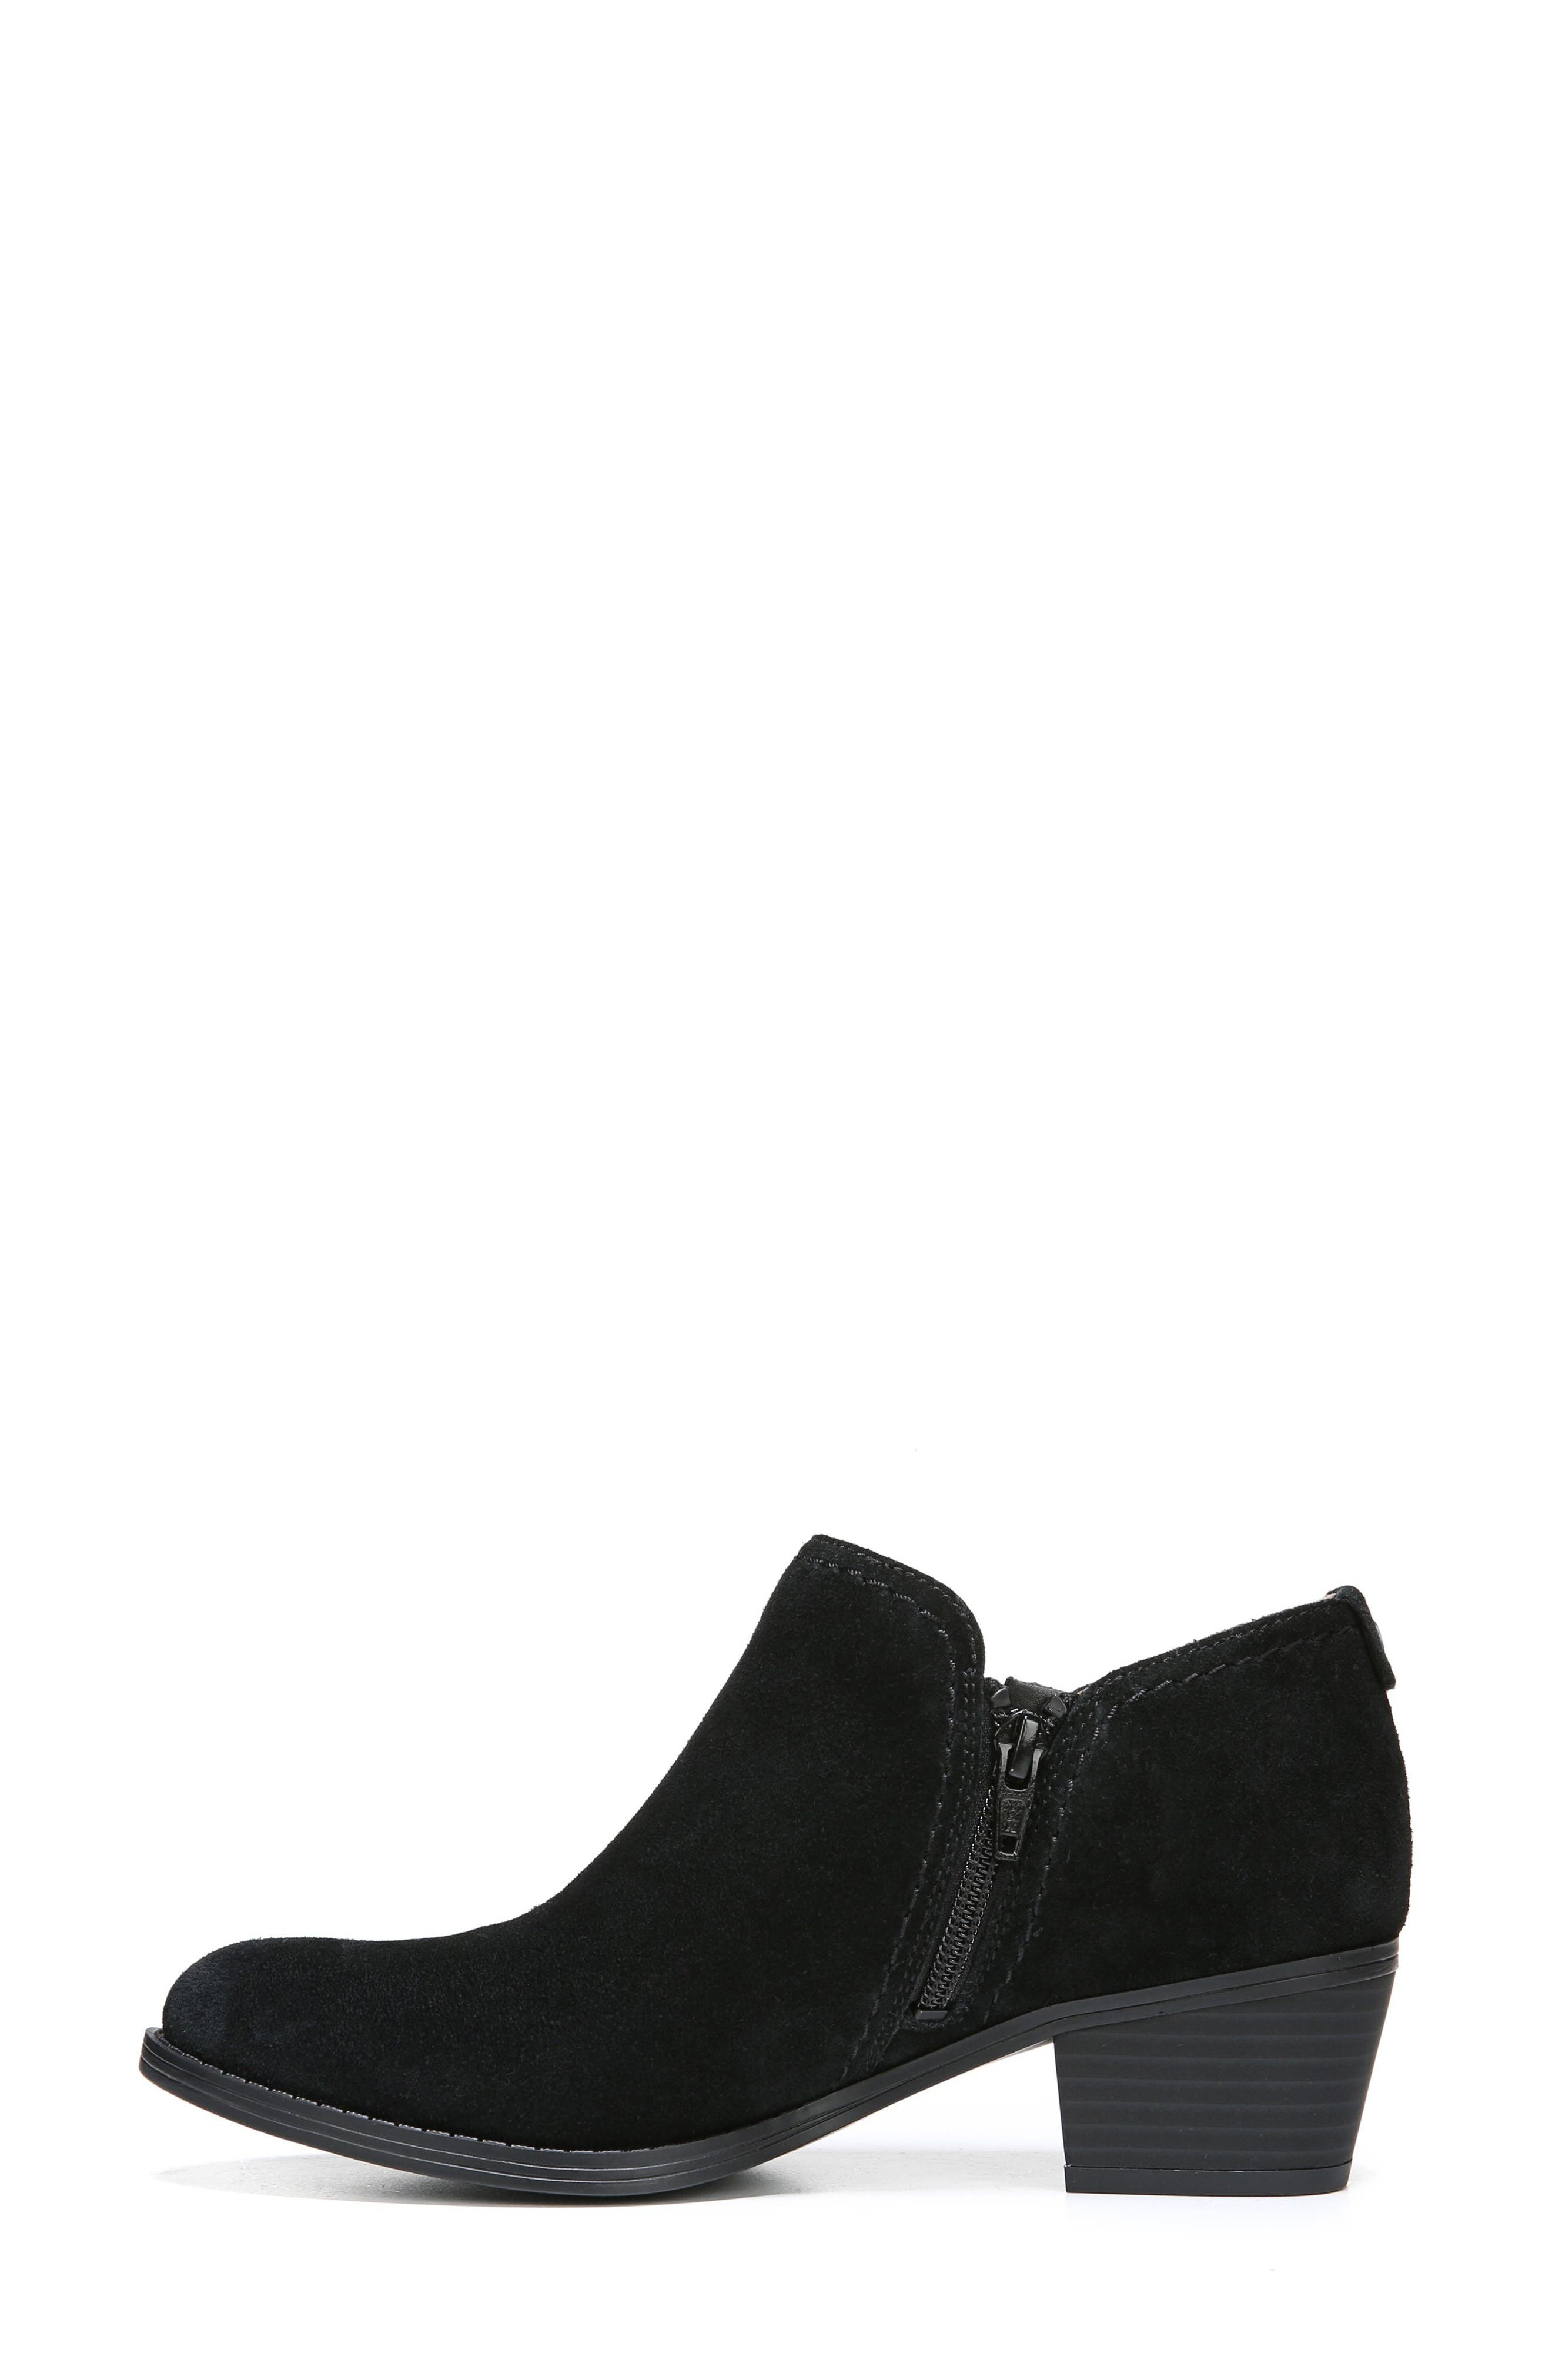 'Zarie' Block Heel Bootie,                             Alternate thumbnail 8, color,                             BLACK SUEDE